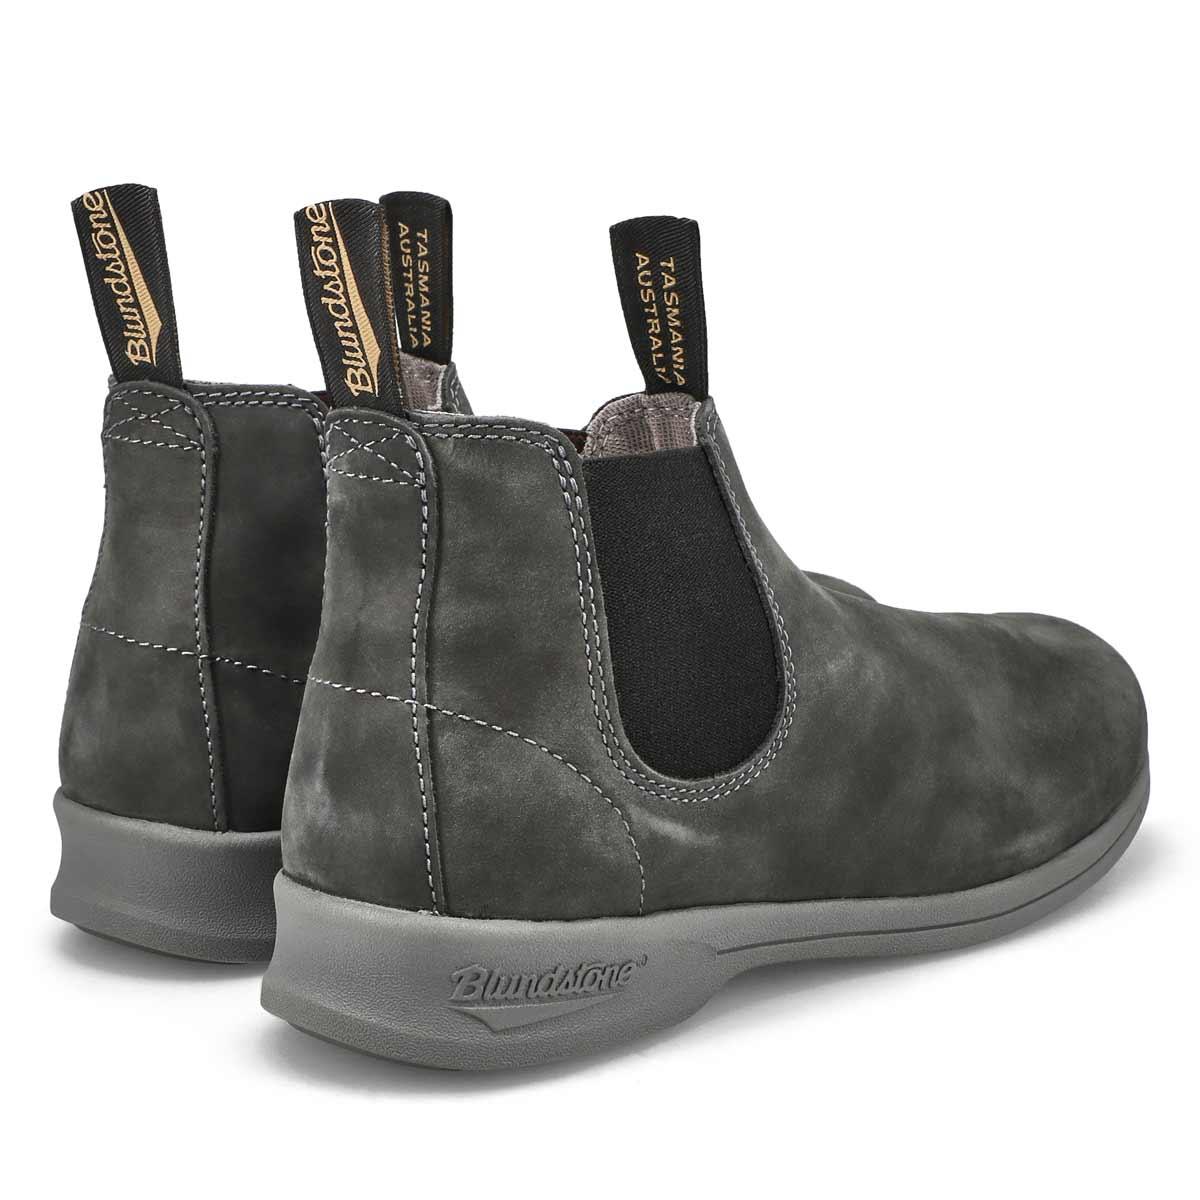 Unisex Active Range black twin gore boot